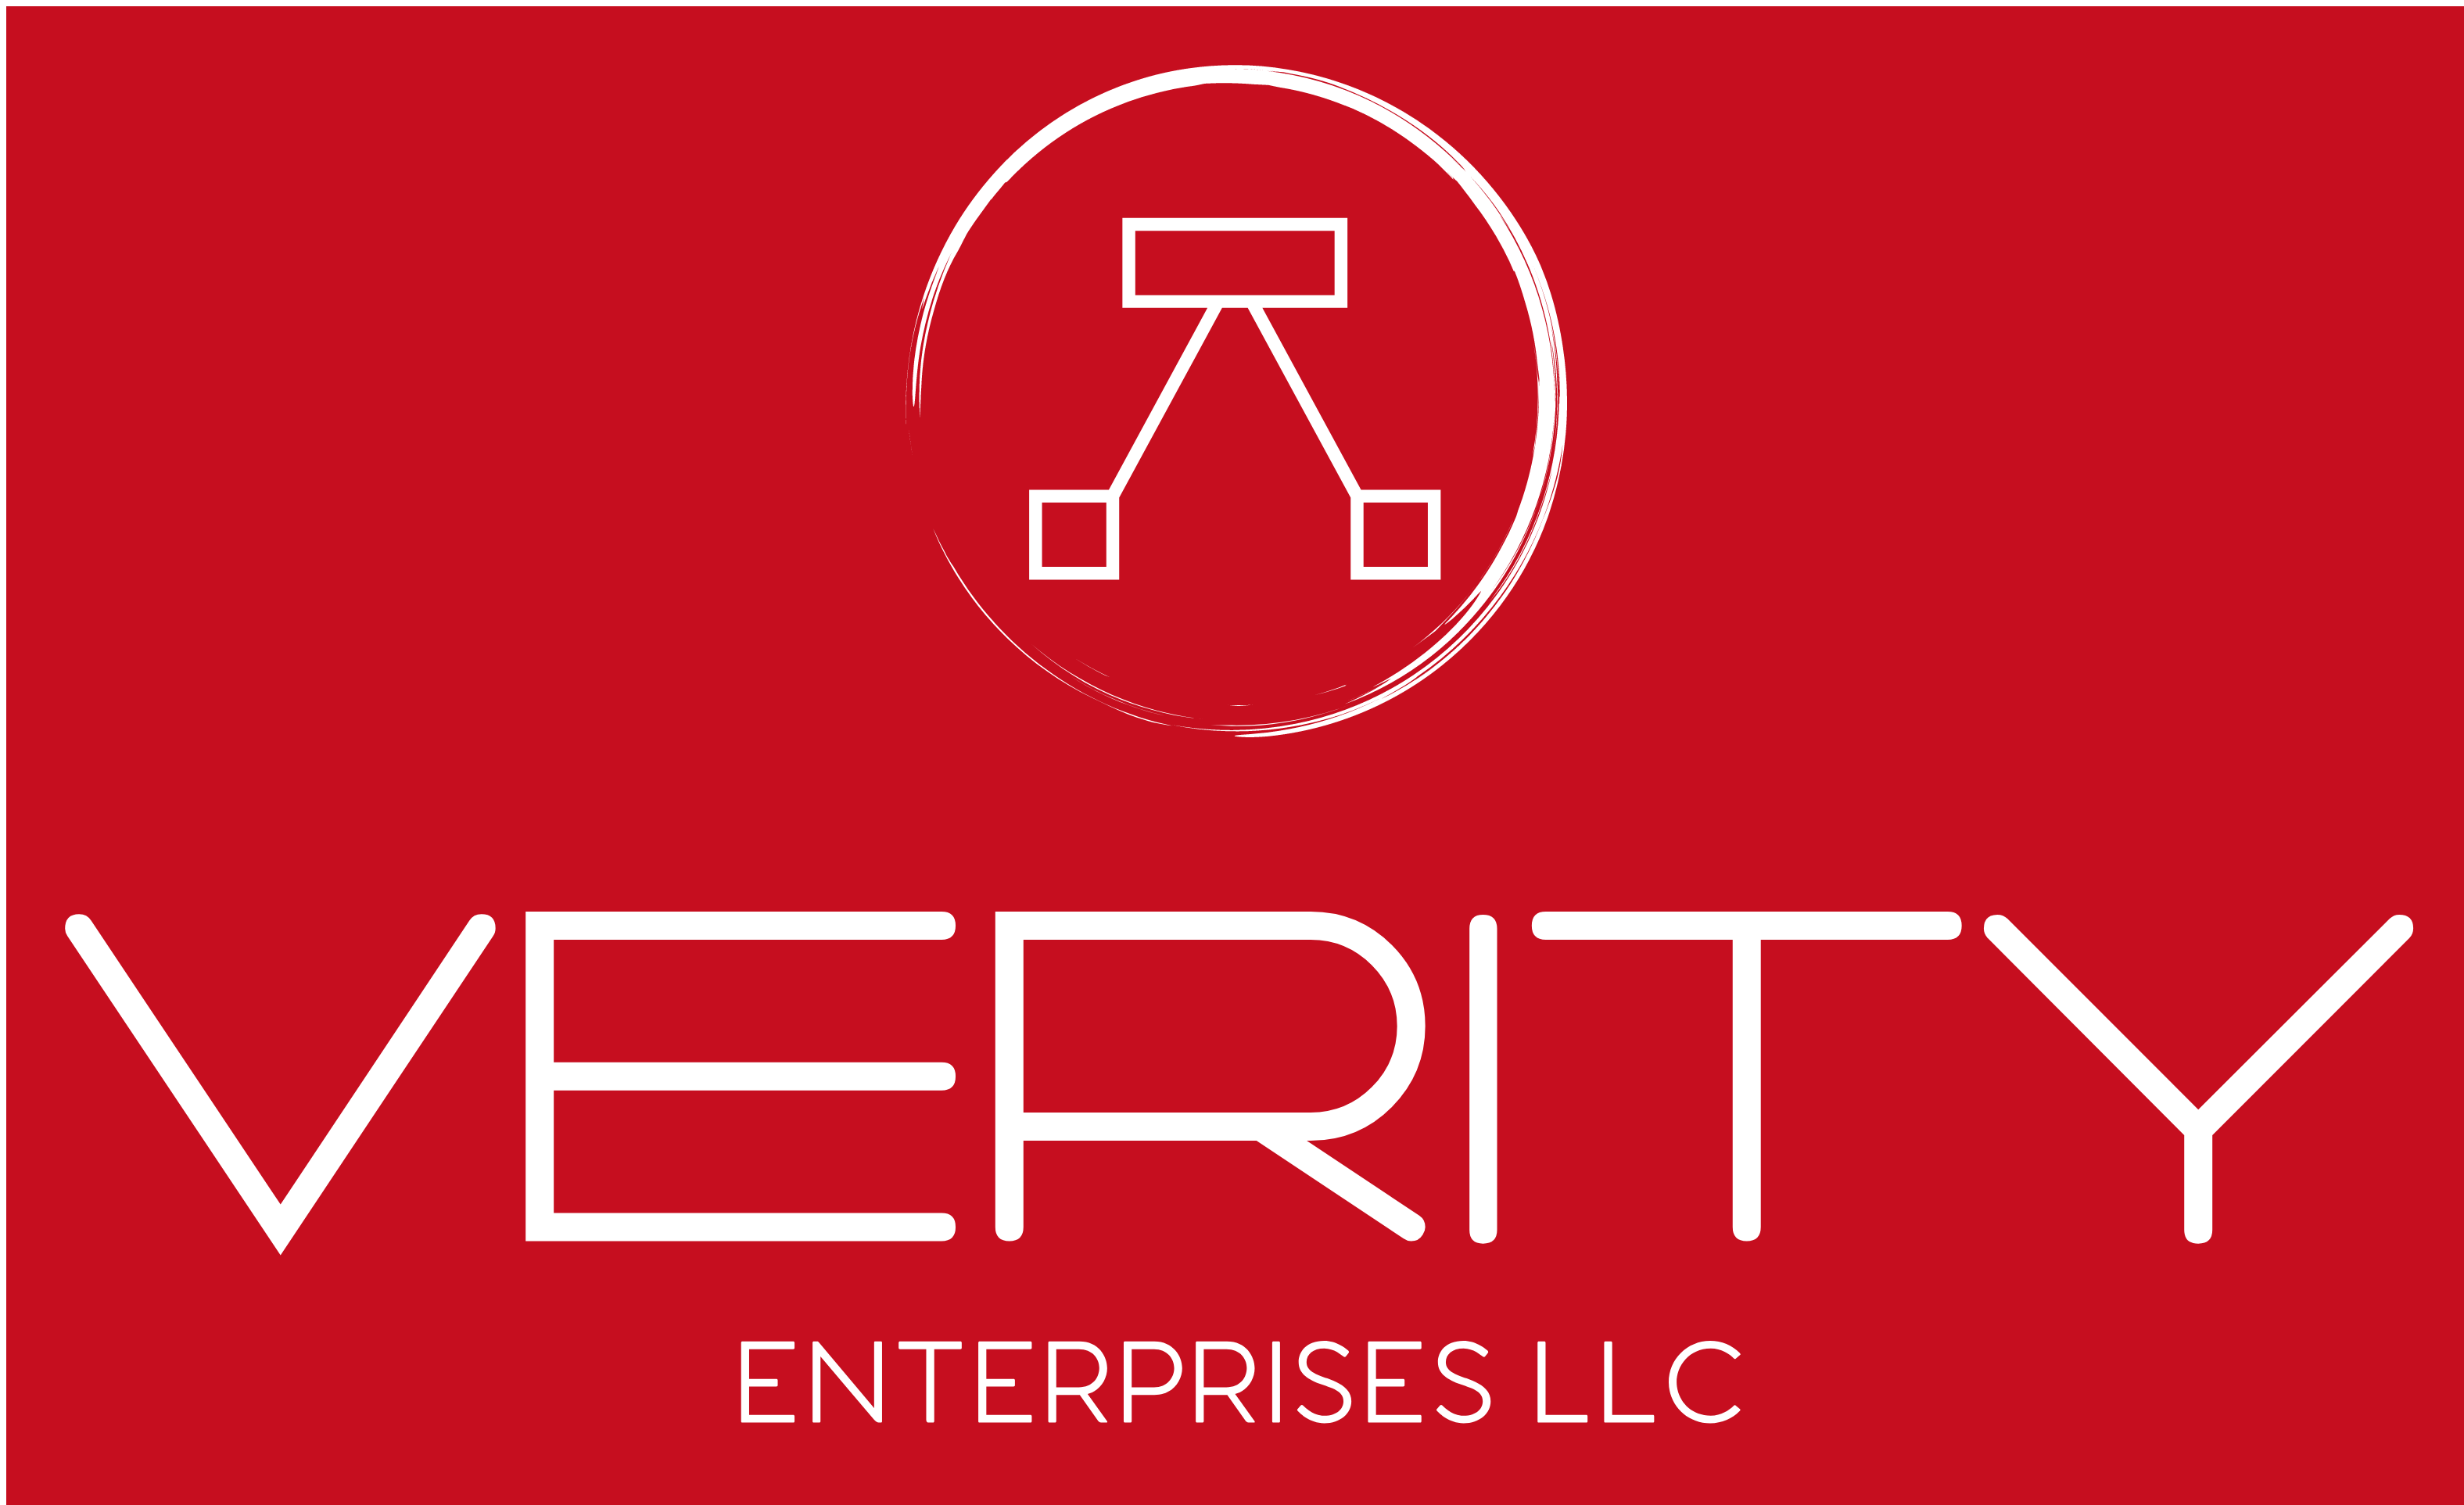 Verity Enterprises LLC